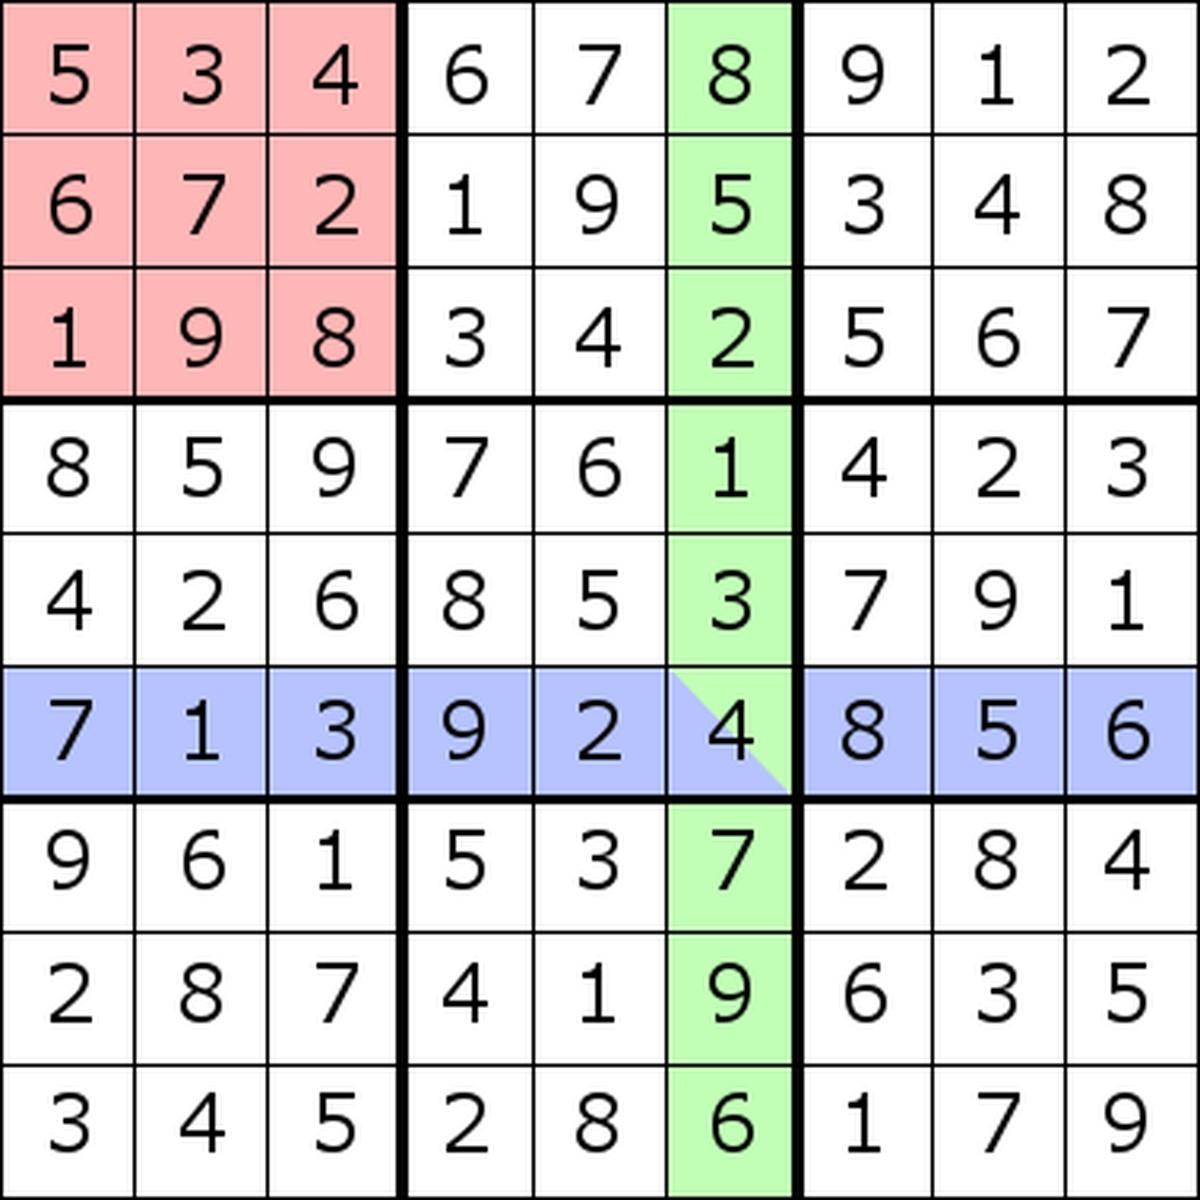 Wie Funktioniert Sudoku? - Einfach Erklärt - Chip in Sudoku Anleitung